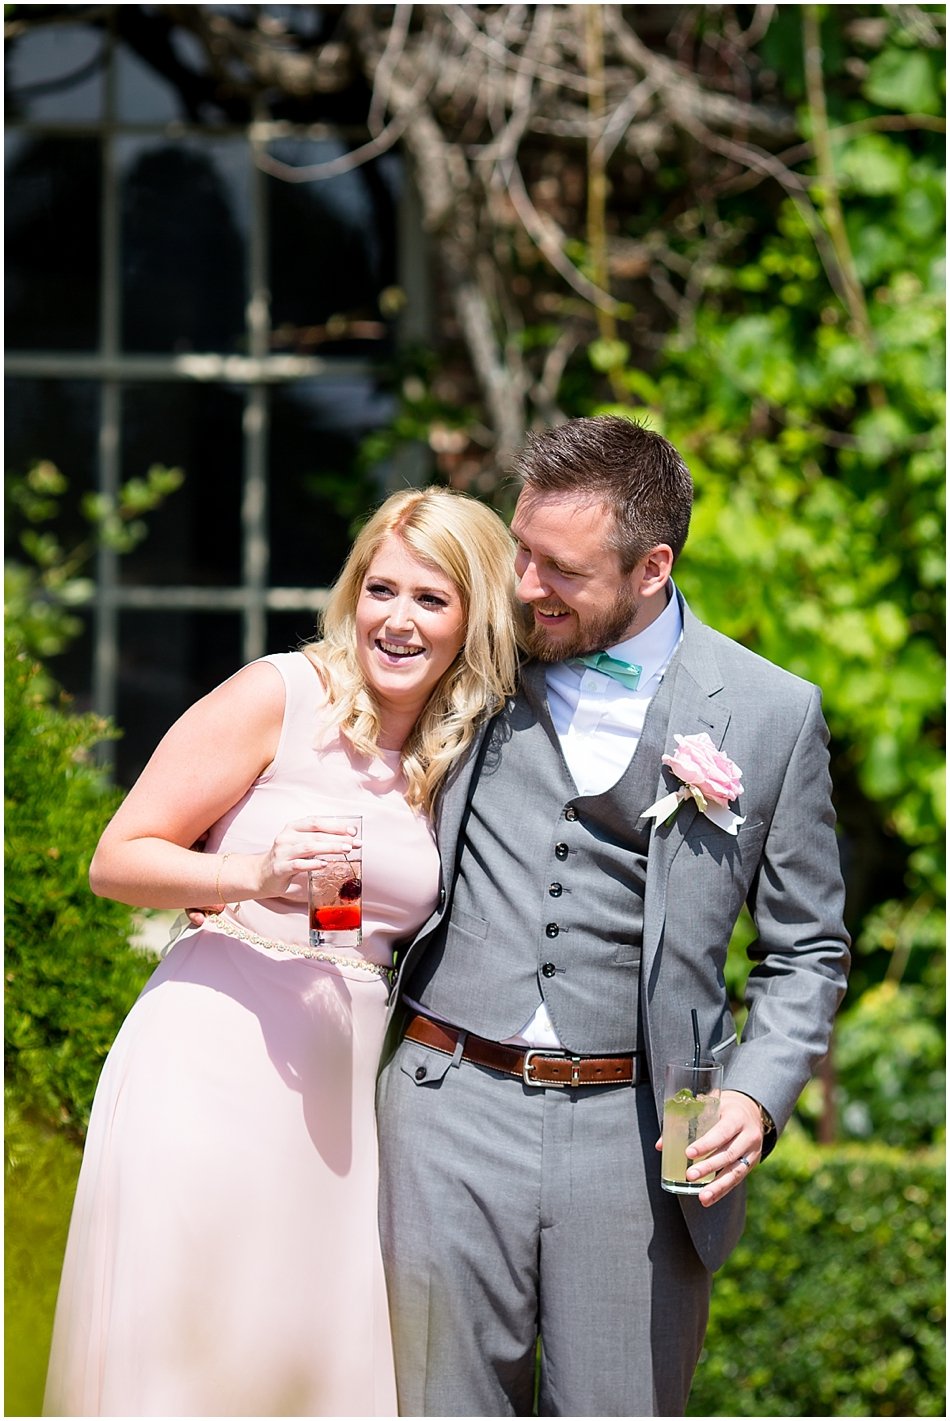 Narborough Hall Wedding Photography_056